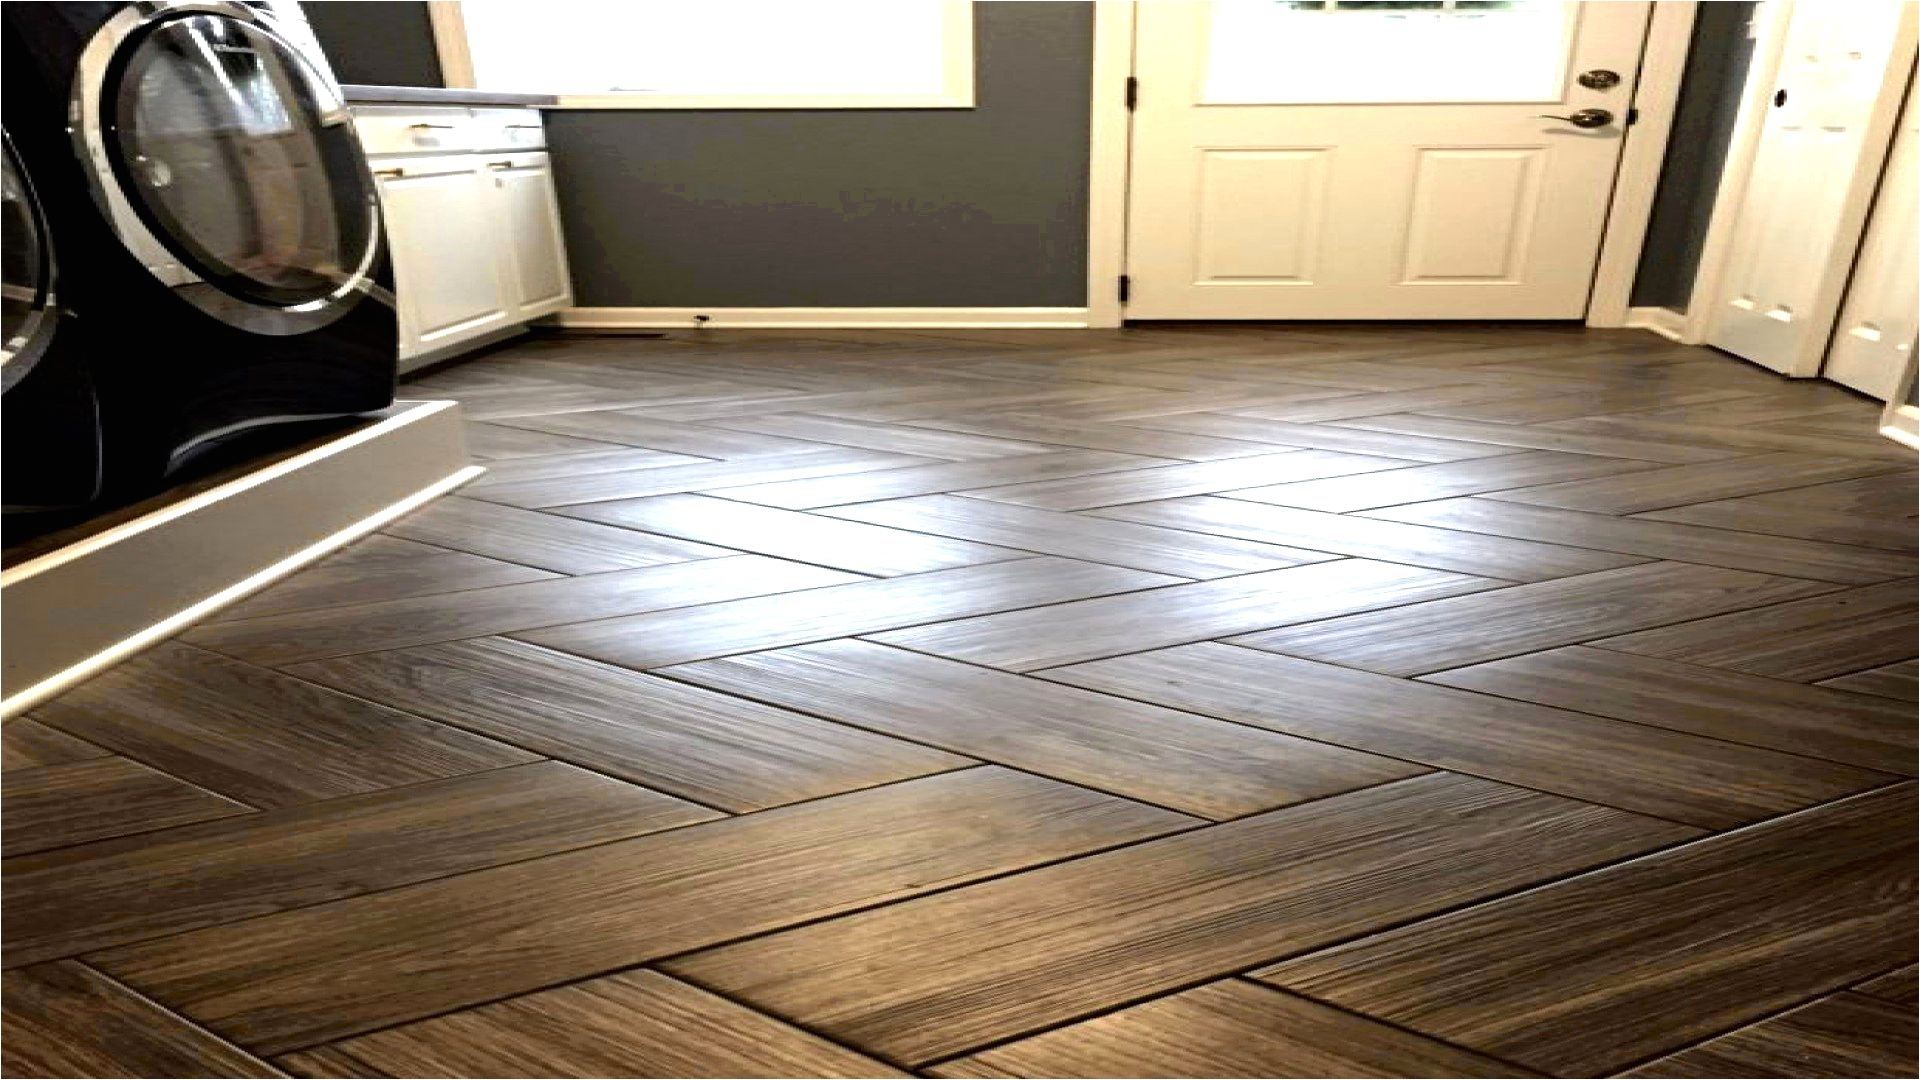 Homedepot Flooring 40 How to Remove Vinyl Floor Tile Inspiration